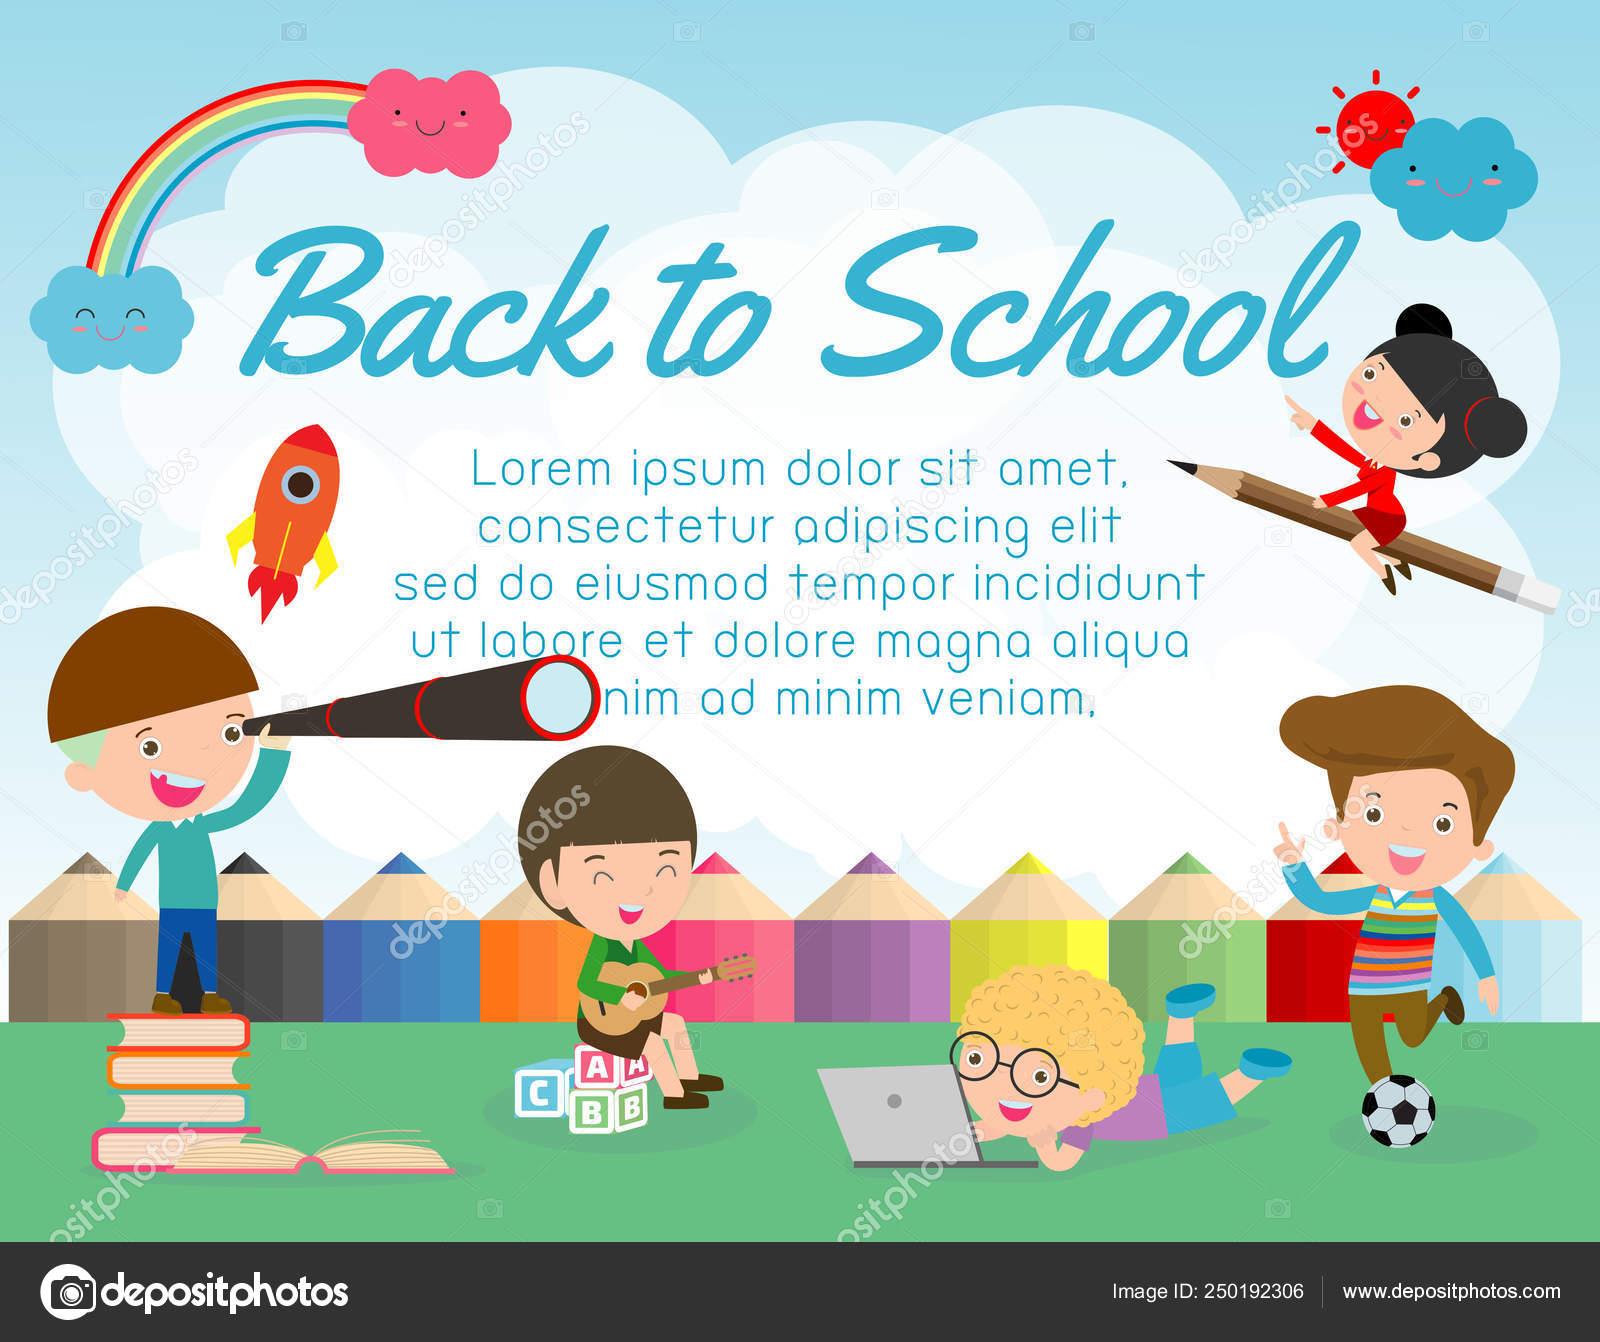 Back School Banner Background Welcome Back School Cute School Kids Stock Vector C Phanuchat10700 Gmail Com 250192306